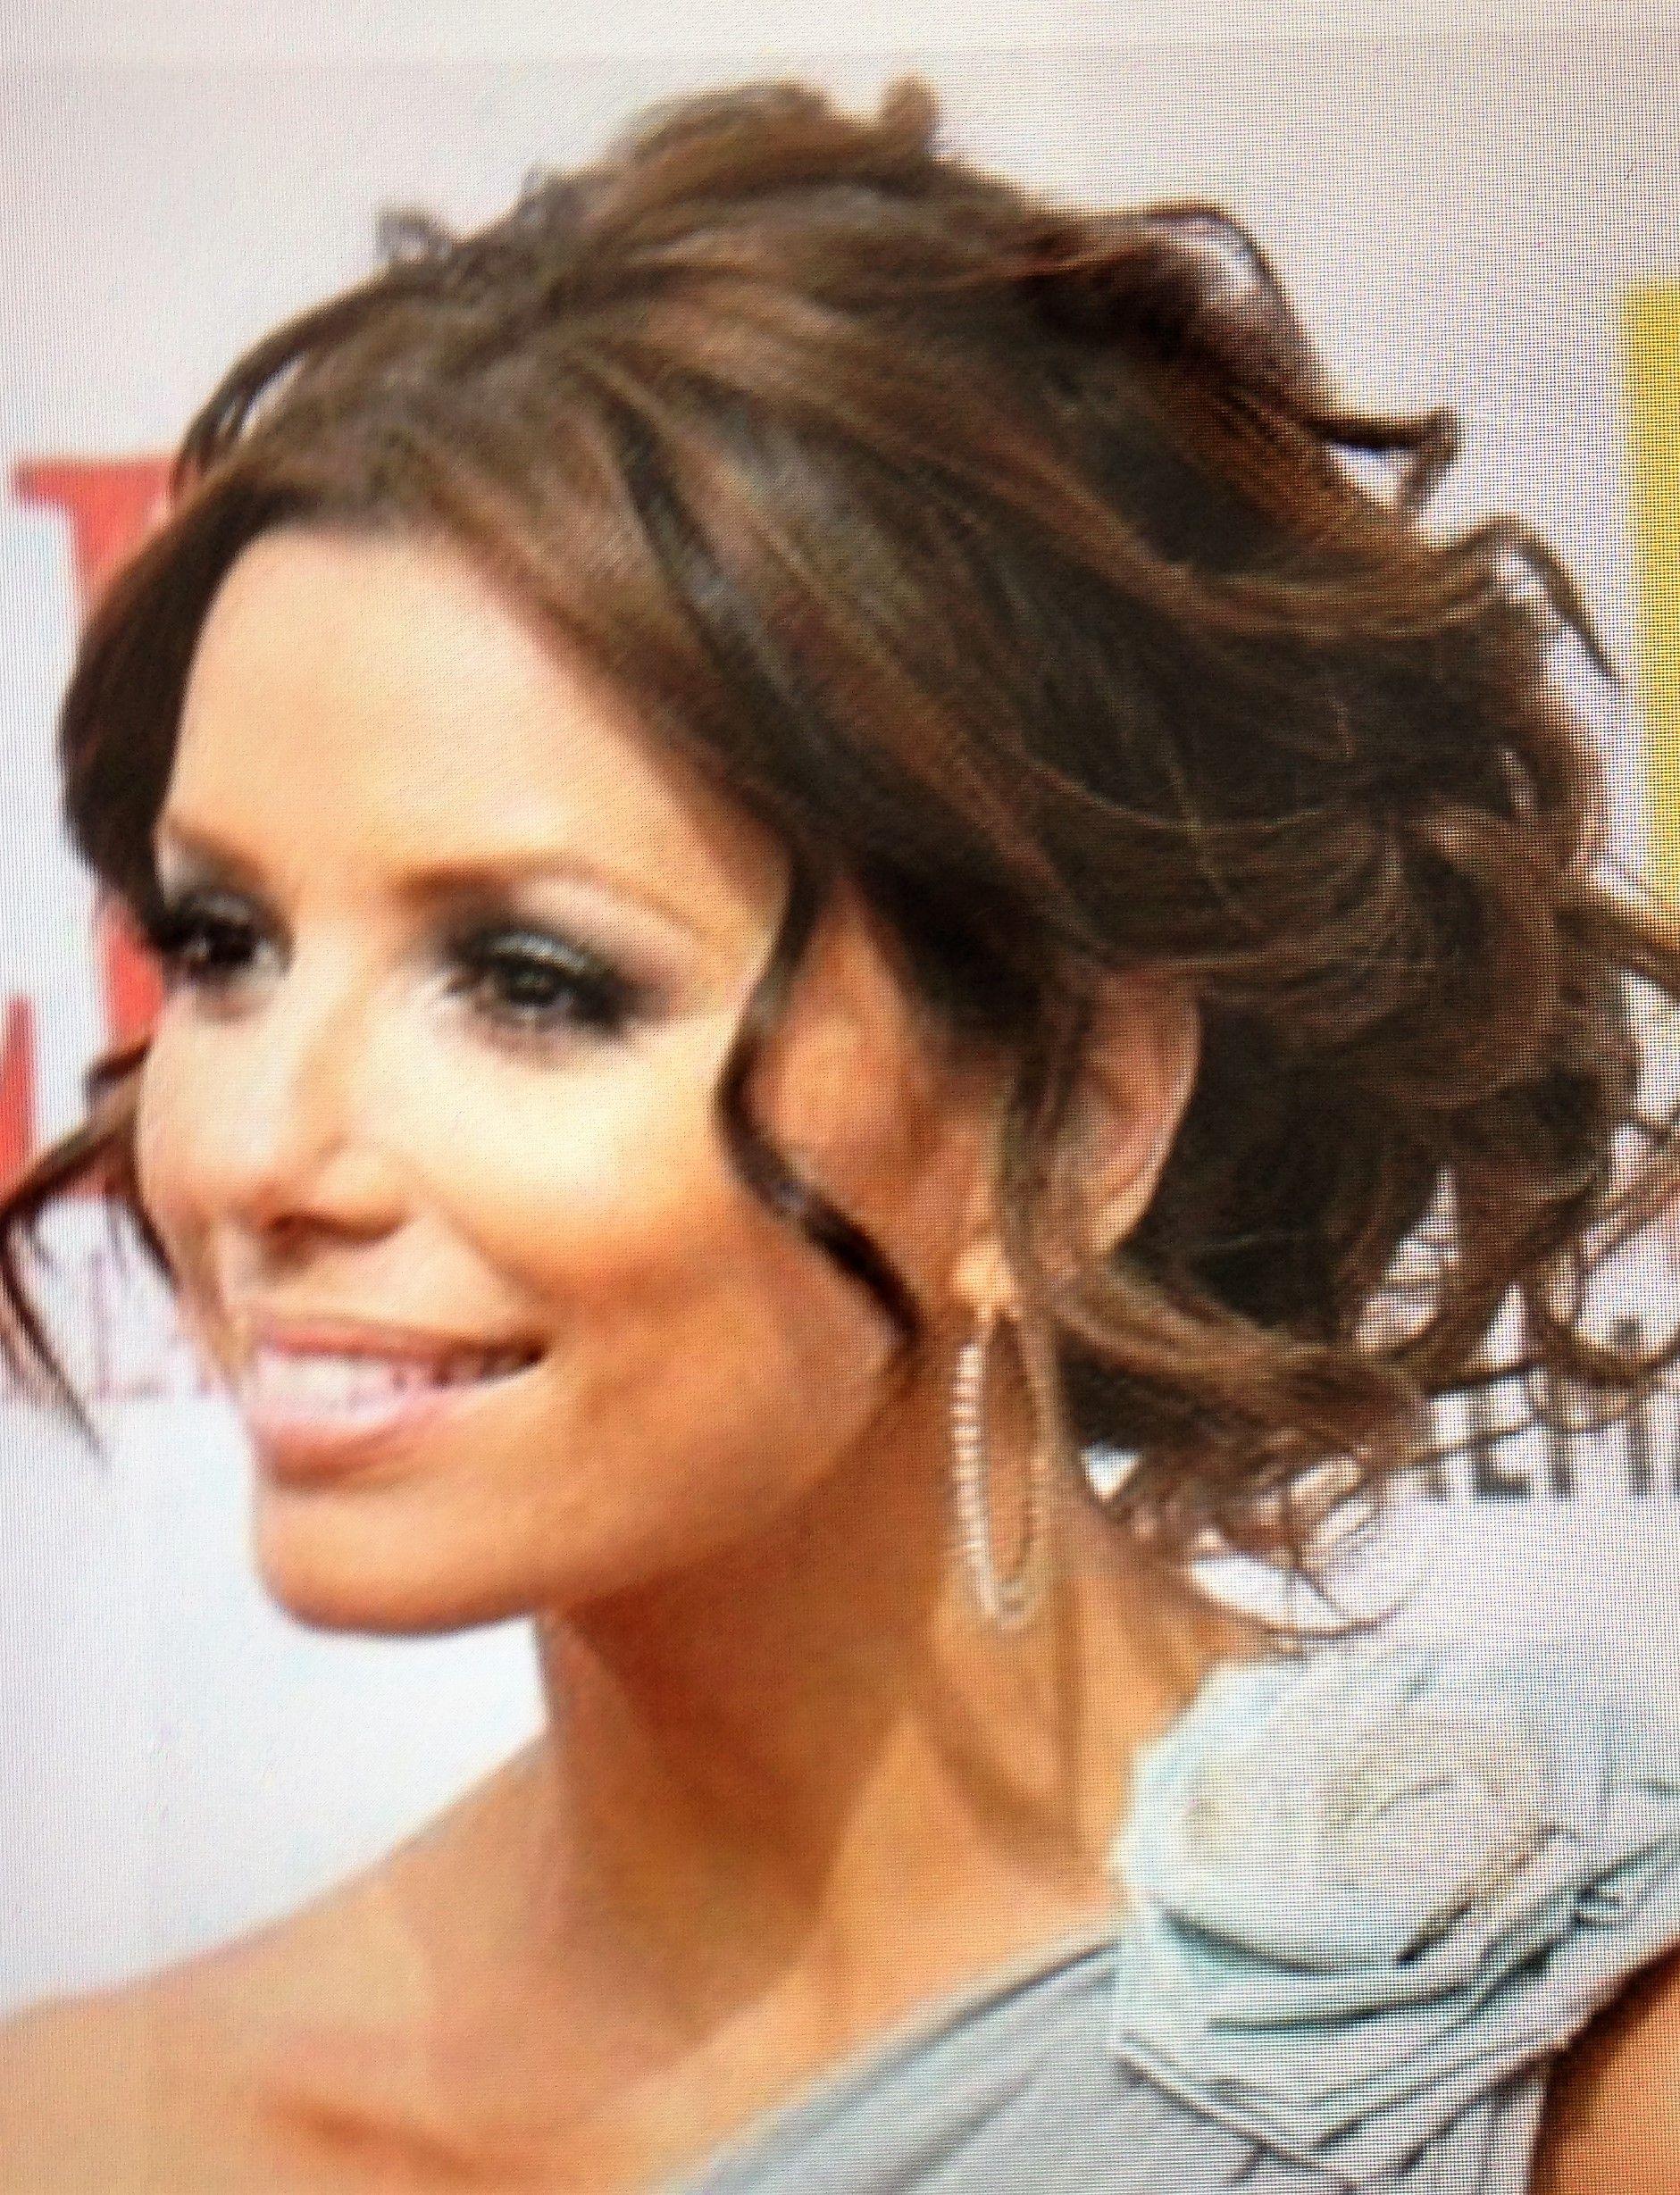 Peinado Matrimonio Wedding Hair Inspiration Bride Hairstyles For Long Hair Mother Of The Bride Hair